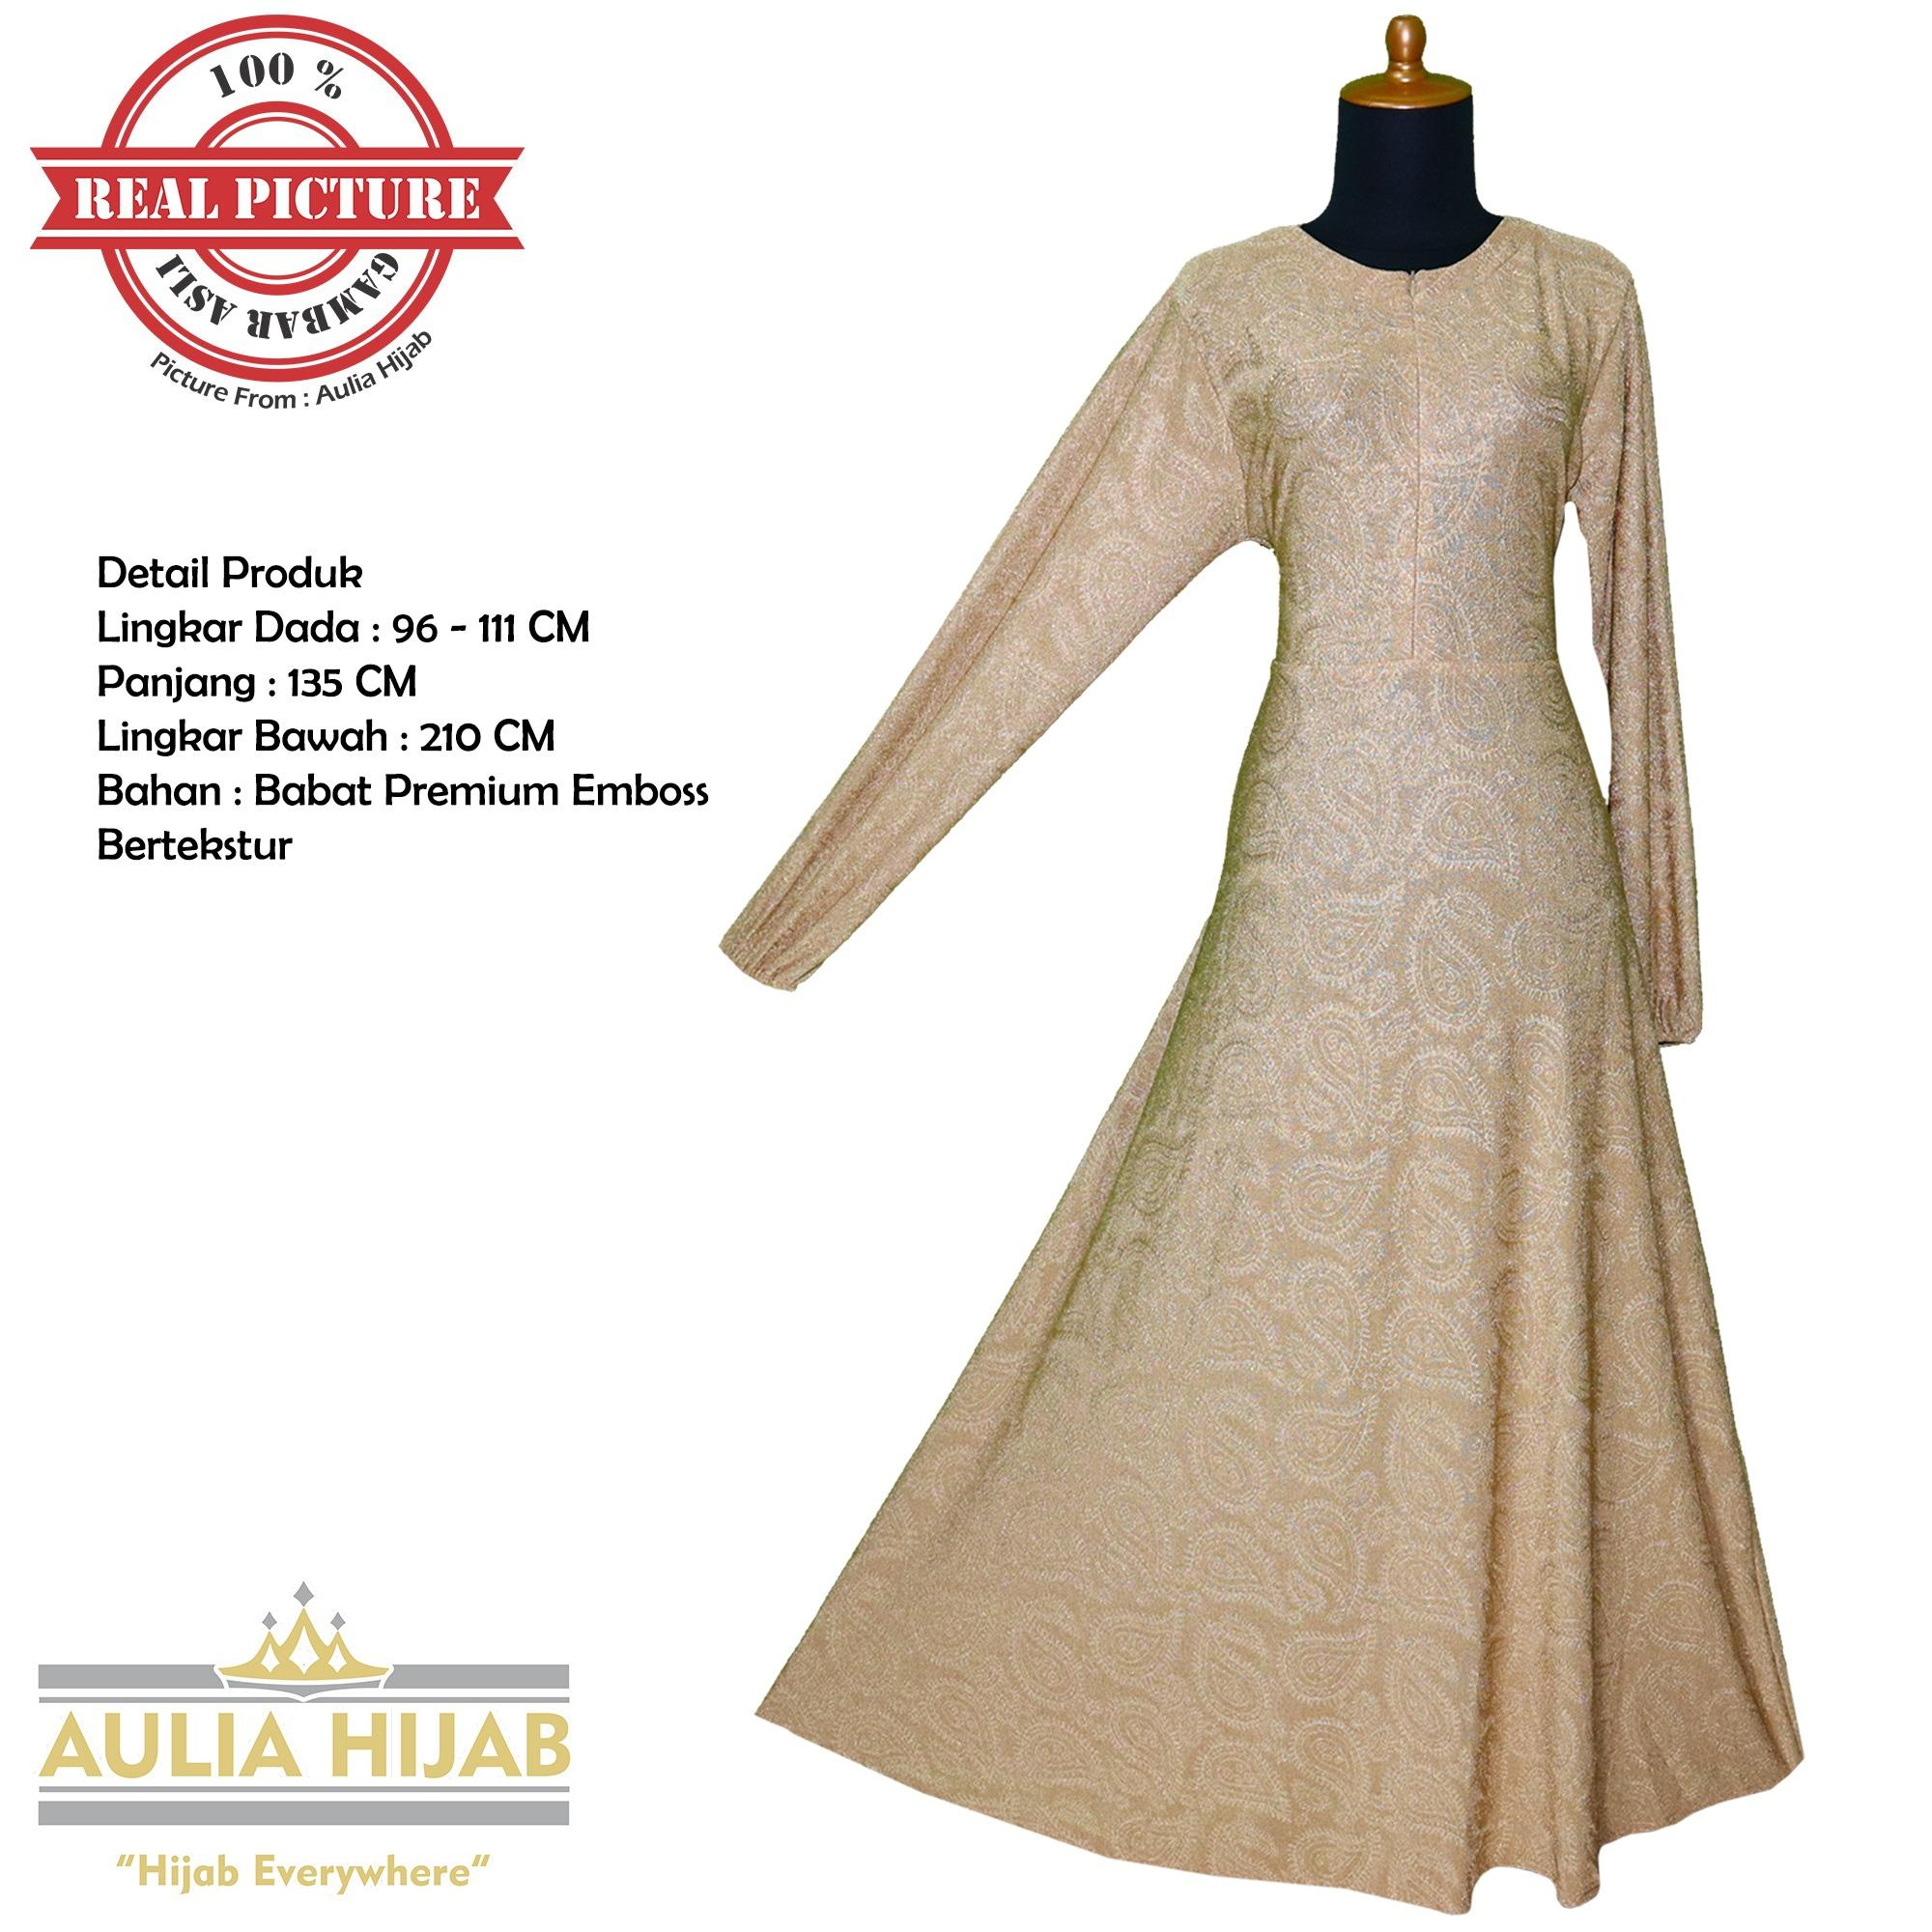 Toko Aulia Hijab Gamis Siera Dress Bahan Babat Premium Emboss Gamis Babat Gamis Kaos Gamis Premium Gamis Murah Gamis Cantik Gamis Terbaru Gamis Cantik Gamis Terlaris Gamis Syar I Gamis Santai Gamis Pesta Gamis Pesta Termurah Riau